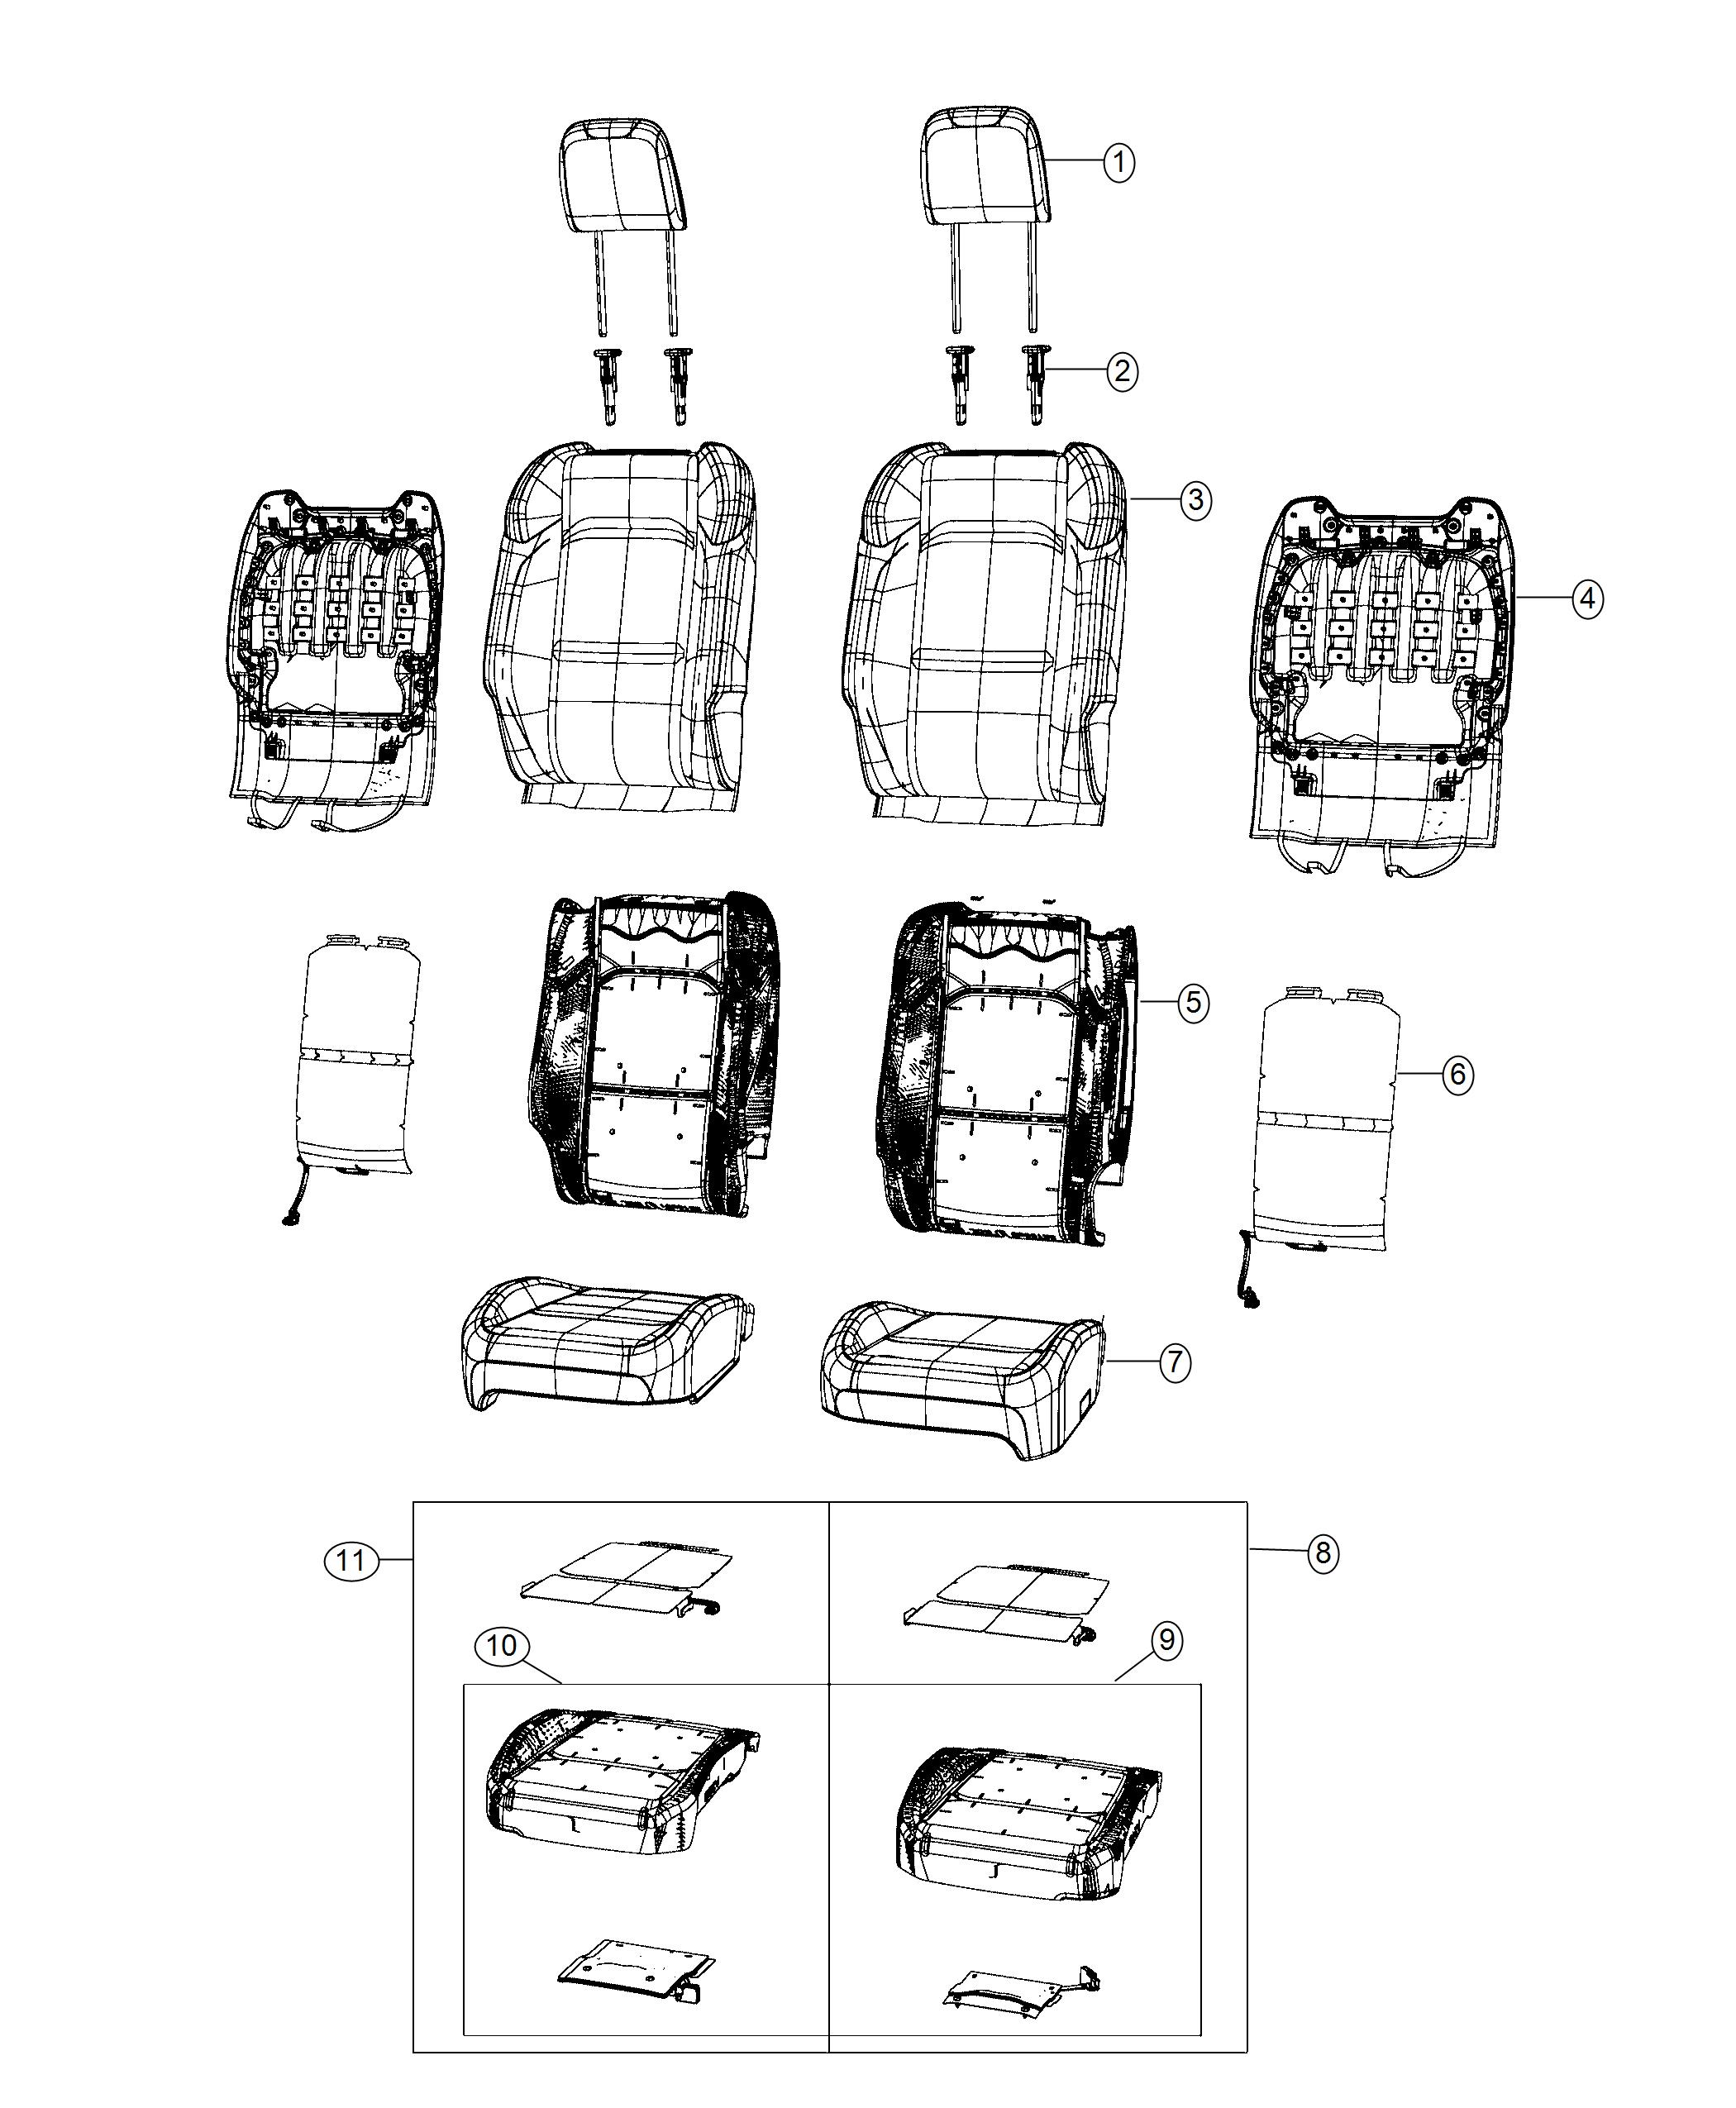 Jeep Wrangler Module Kit Occupant Classification